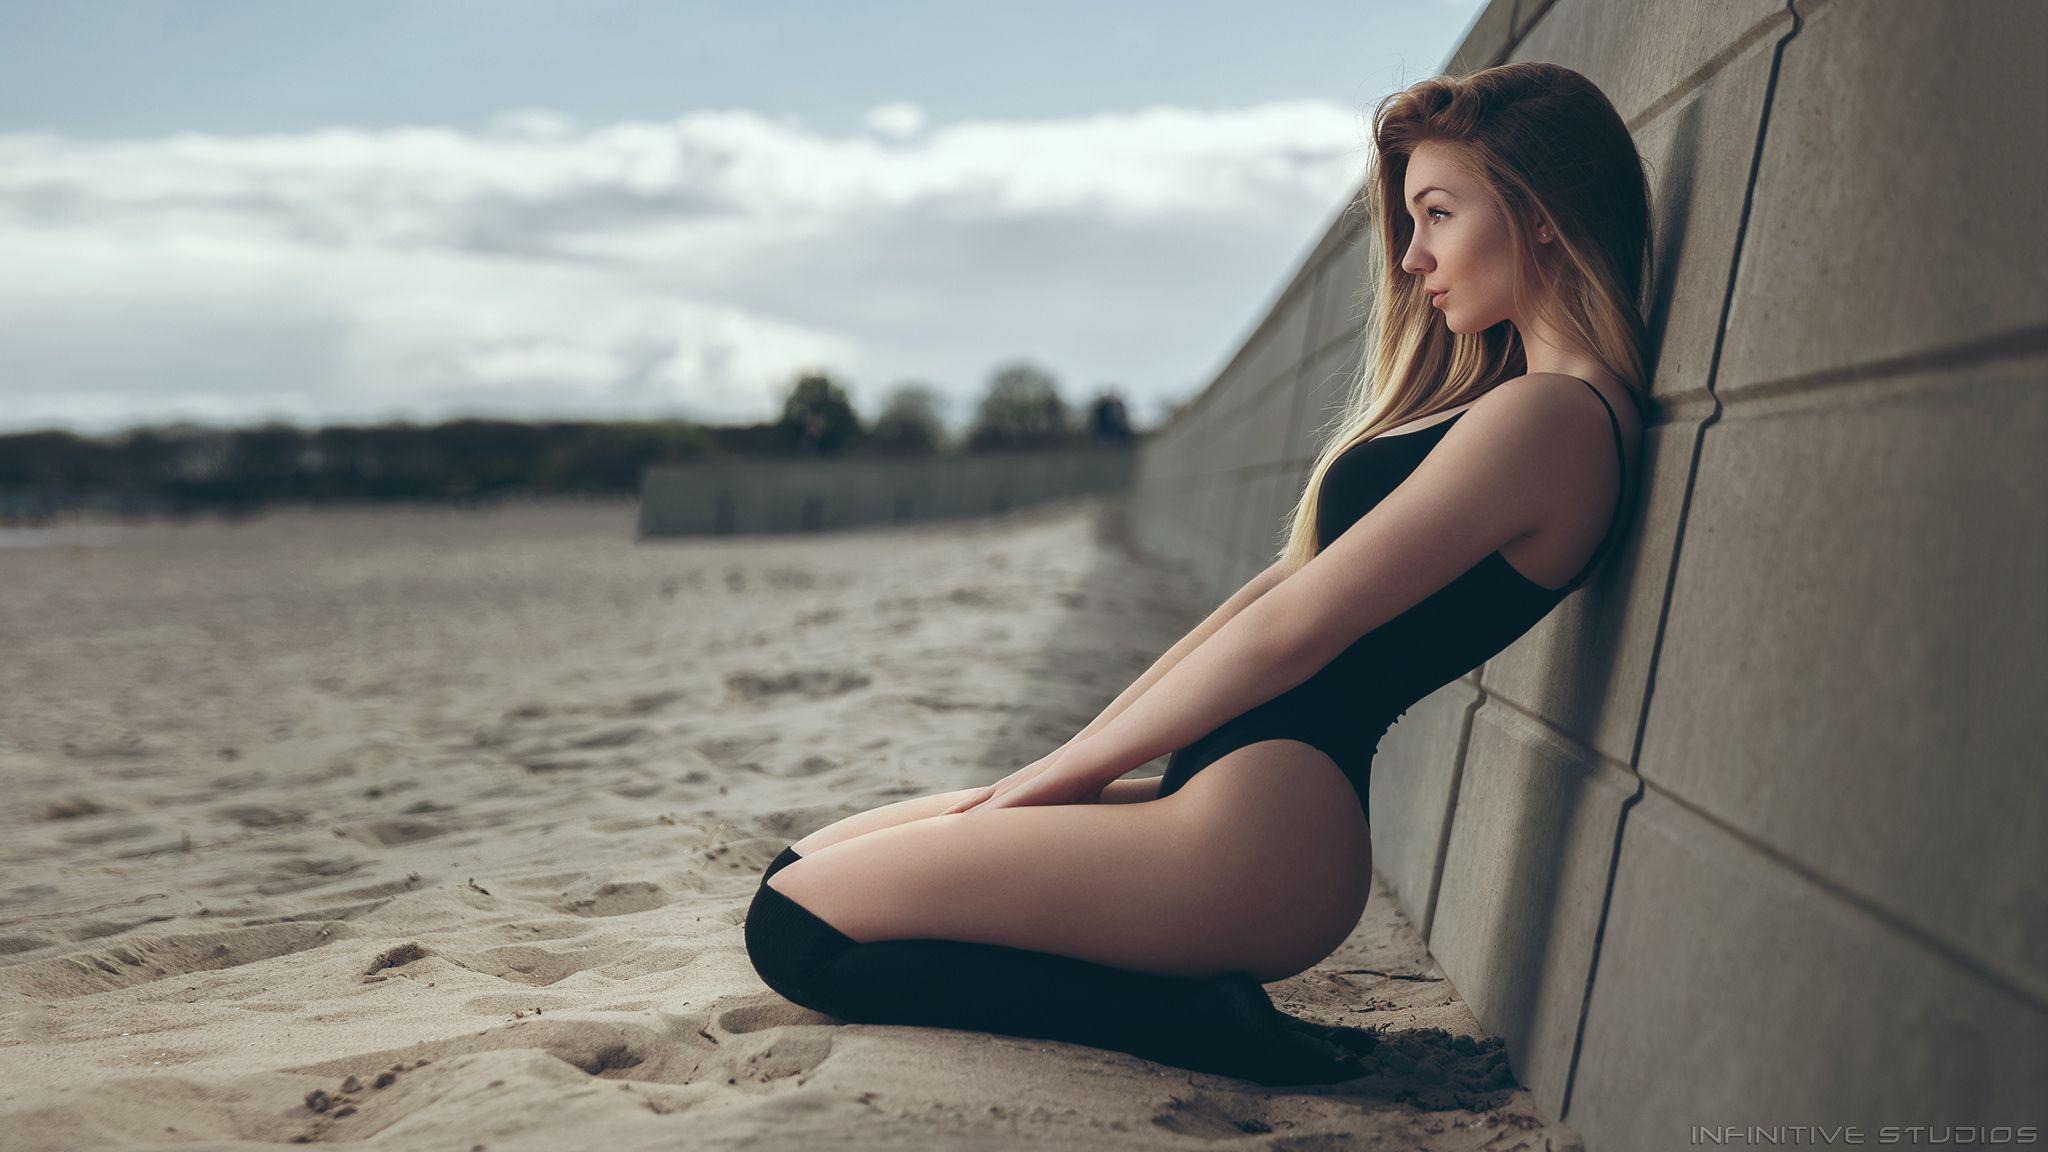 TheFappening : Krista Littlemutt Nude Leaked